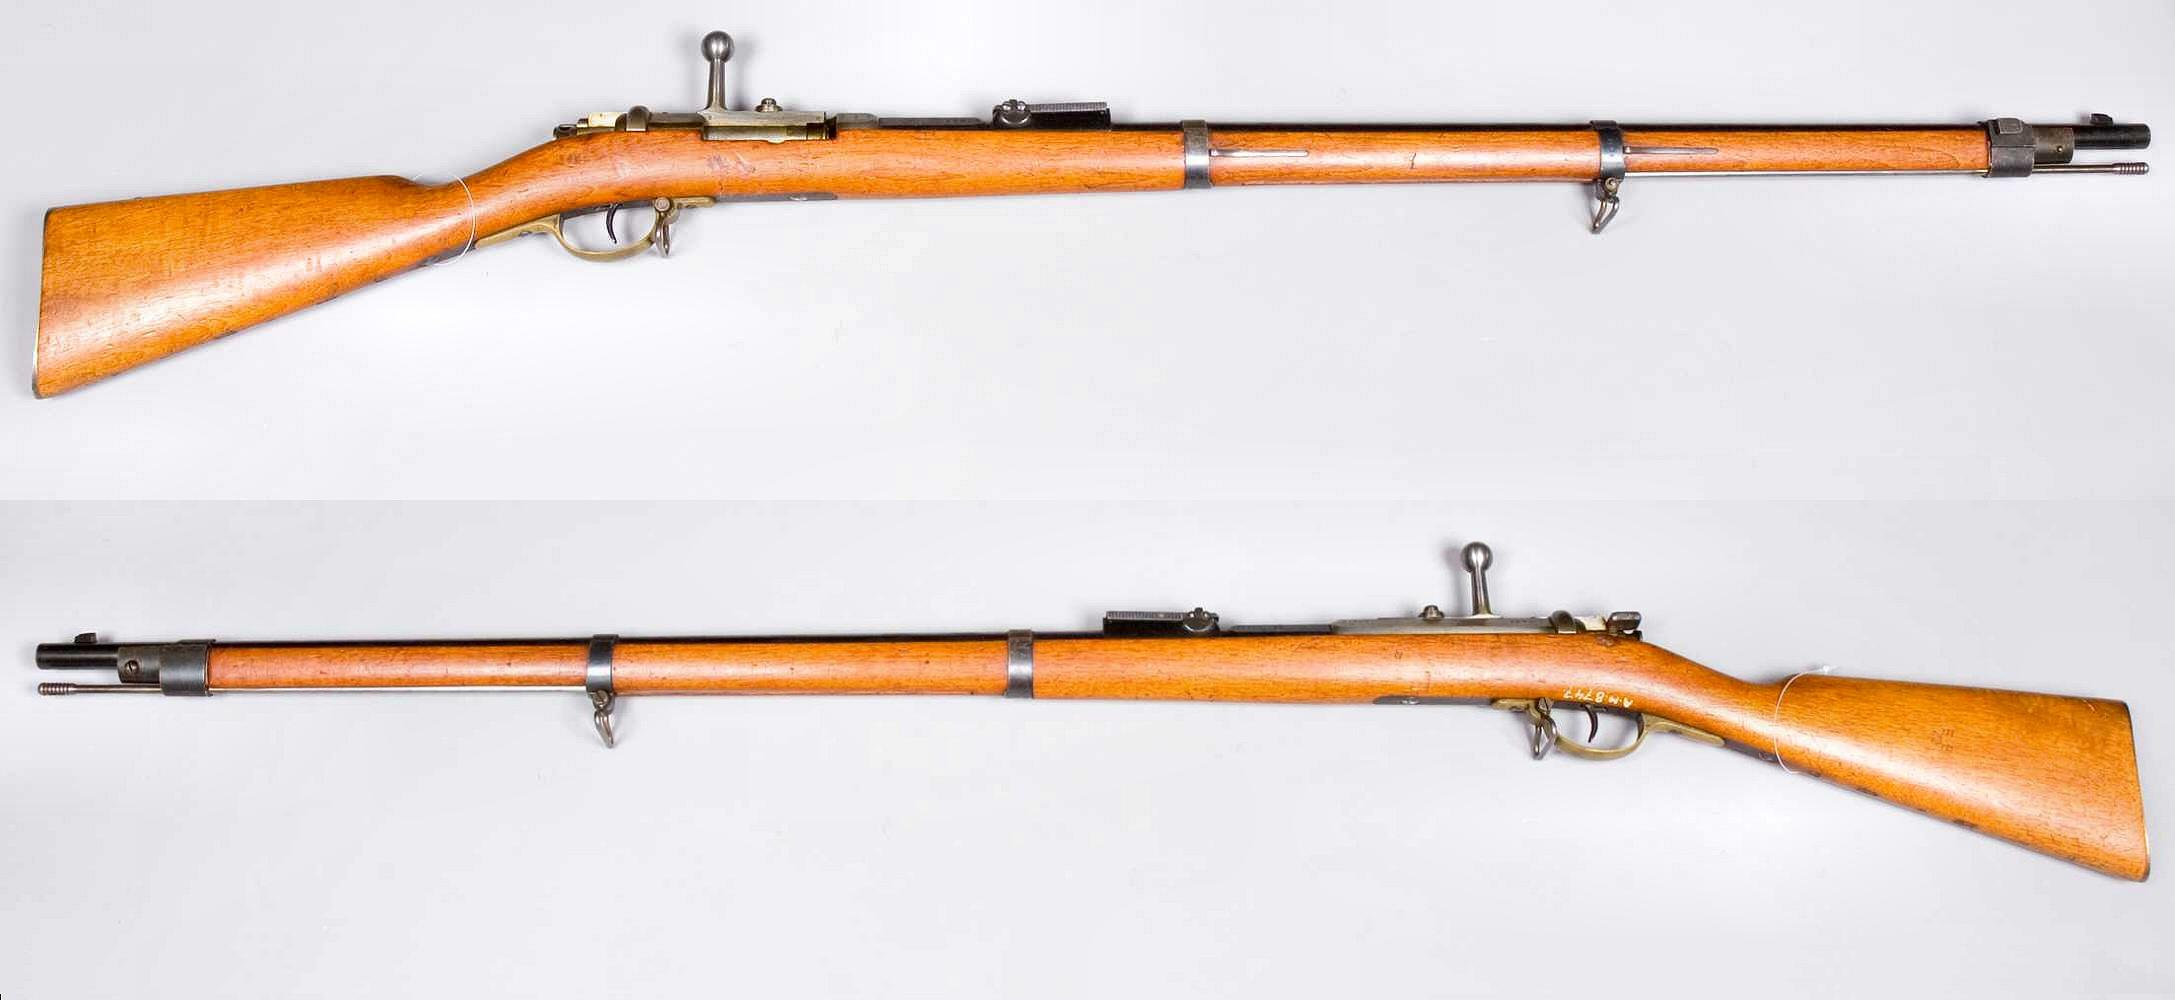 Sks Rear Sight Set Simonov Rifle.the Original Soviet Union Militaria Skillful Manufacture Collectibles